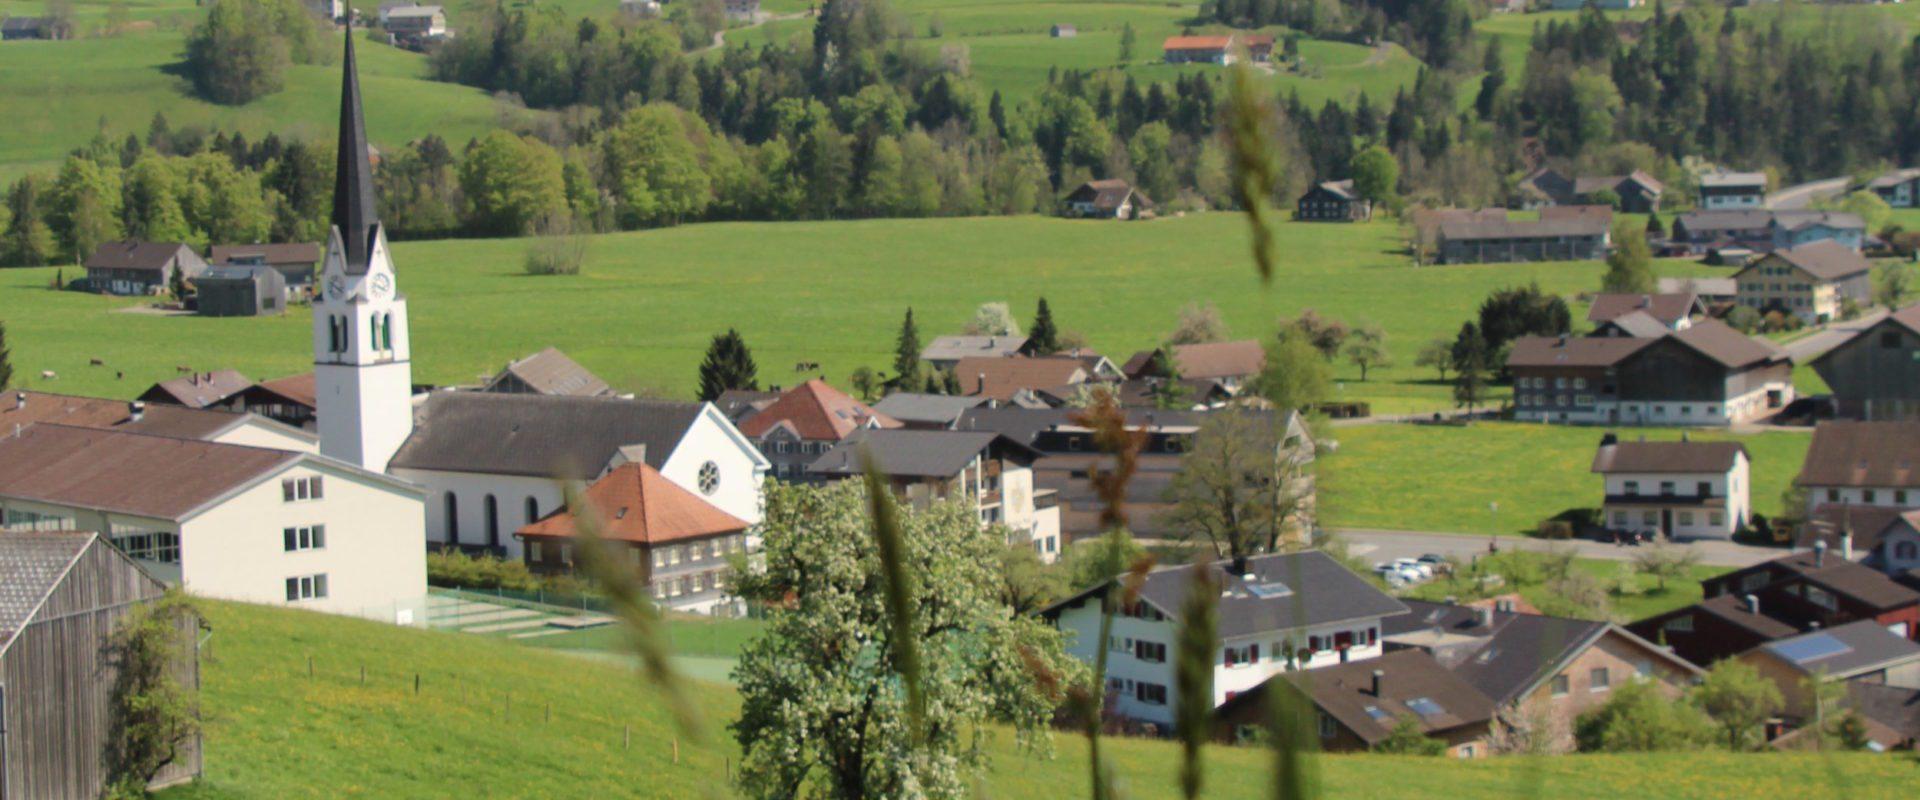 Lingenau Sommer © Tanja Steurer / Lingenau Tourismus